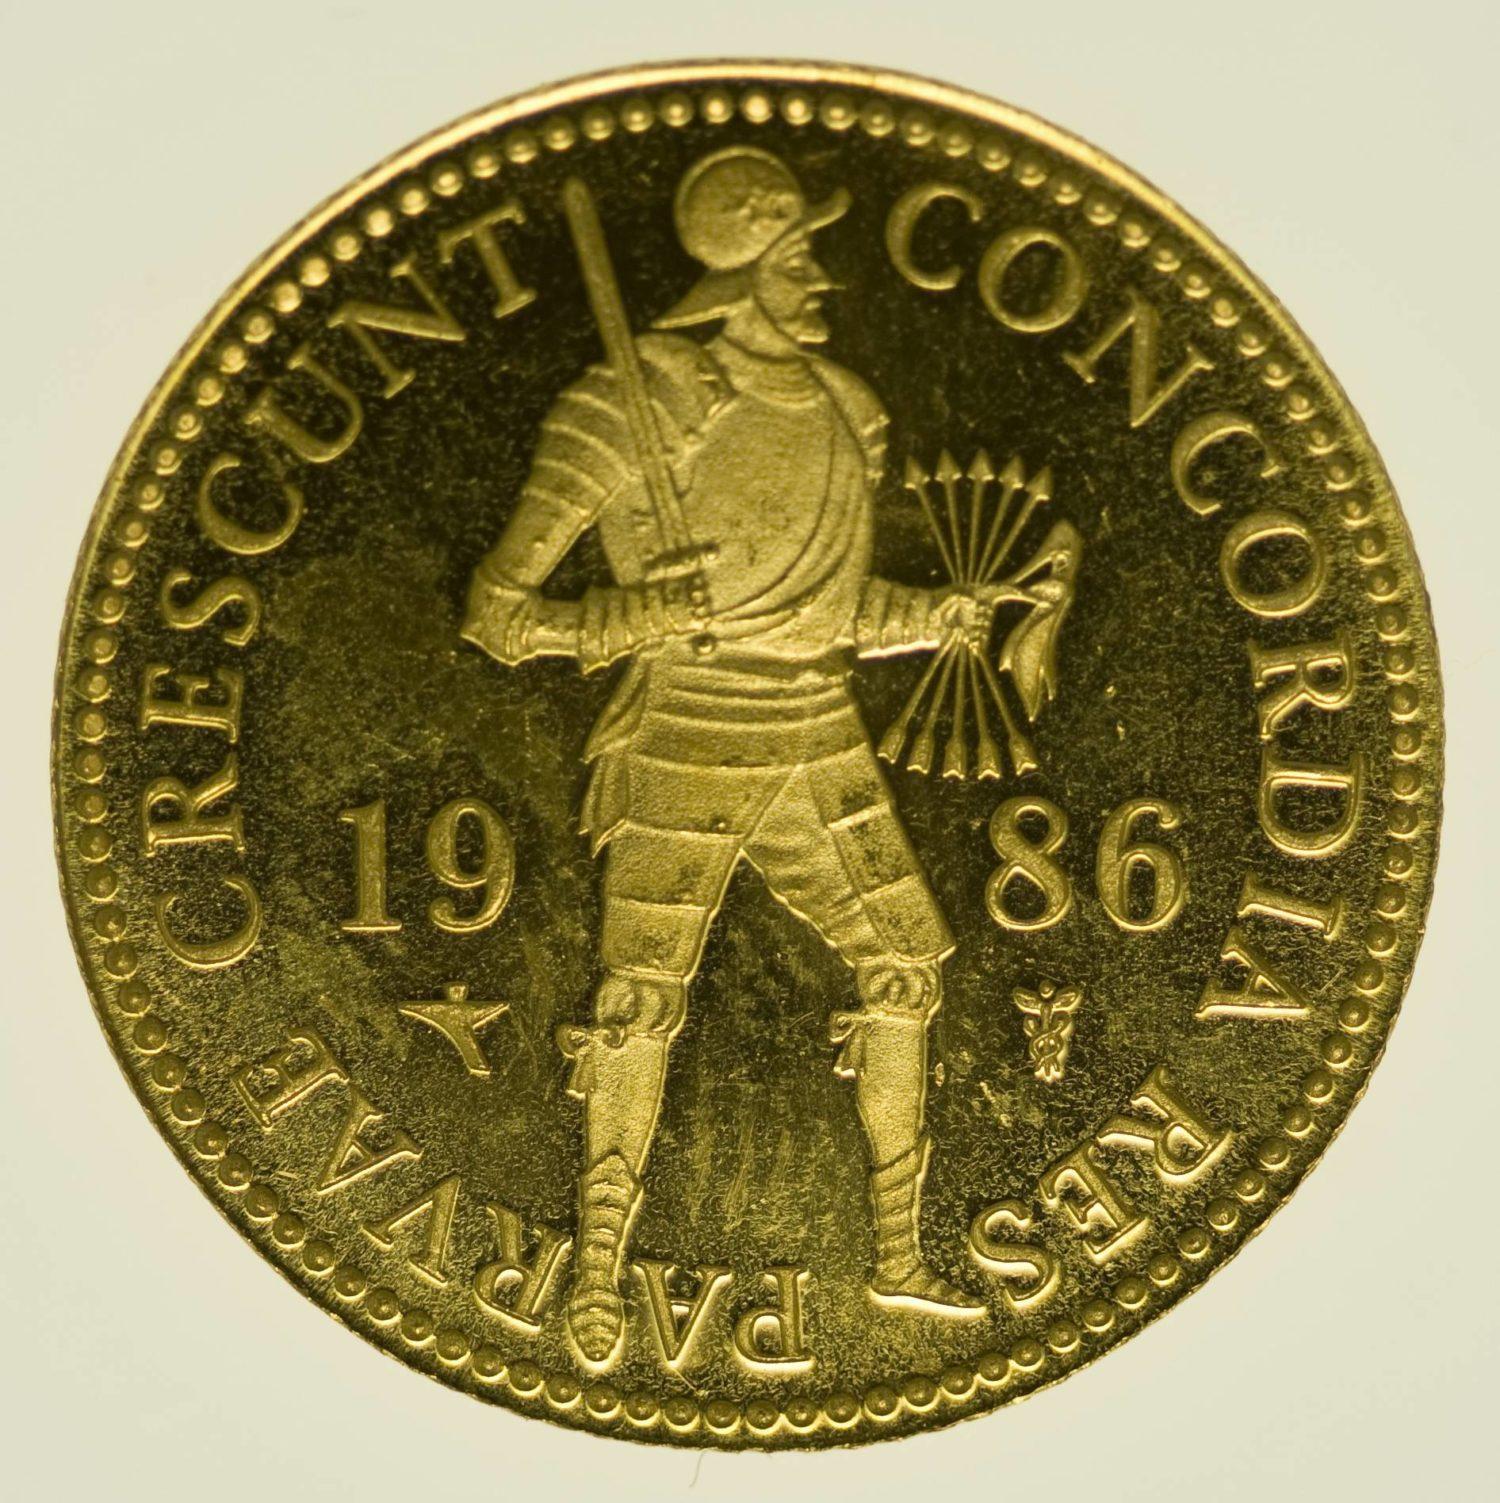 Niederlande Beatrix Dukat 1986 PP Gold 3,44 Gramm fein RAR